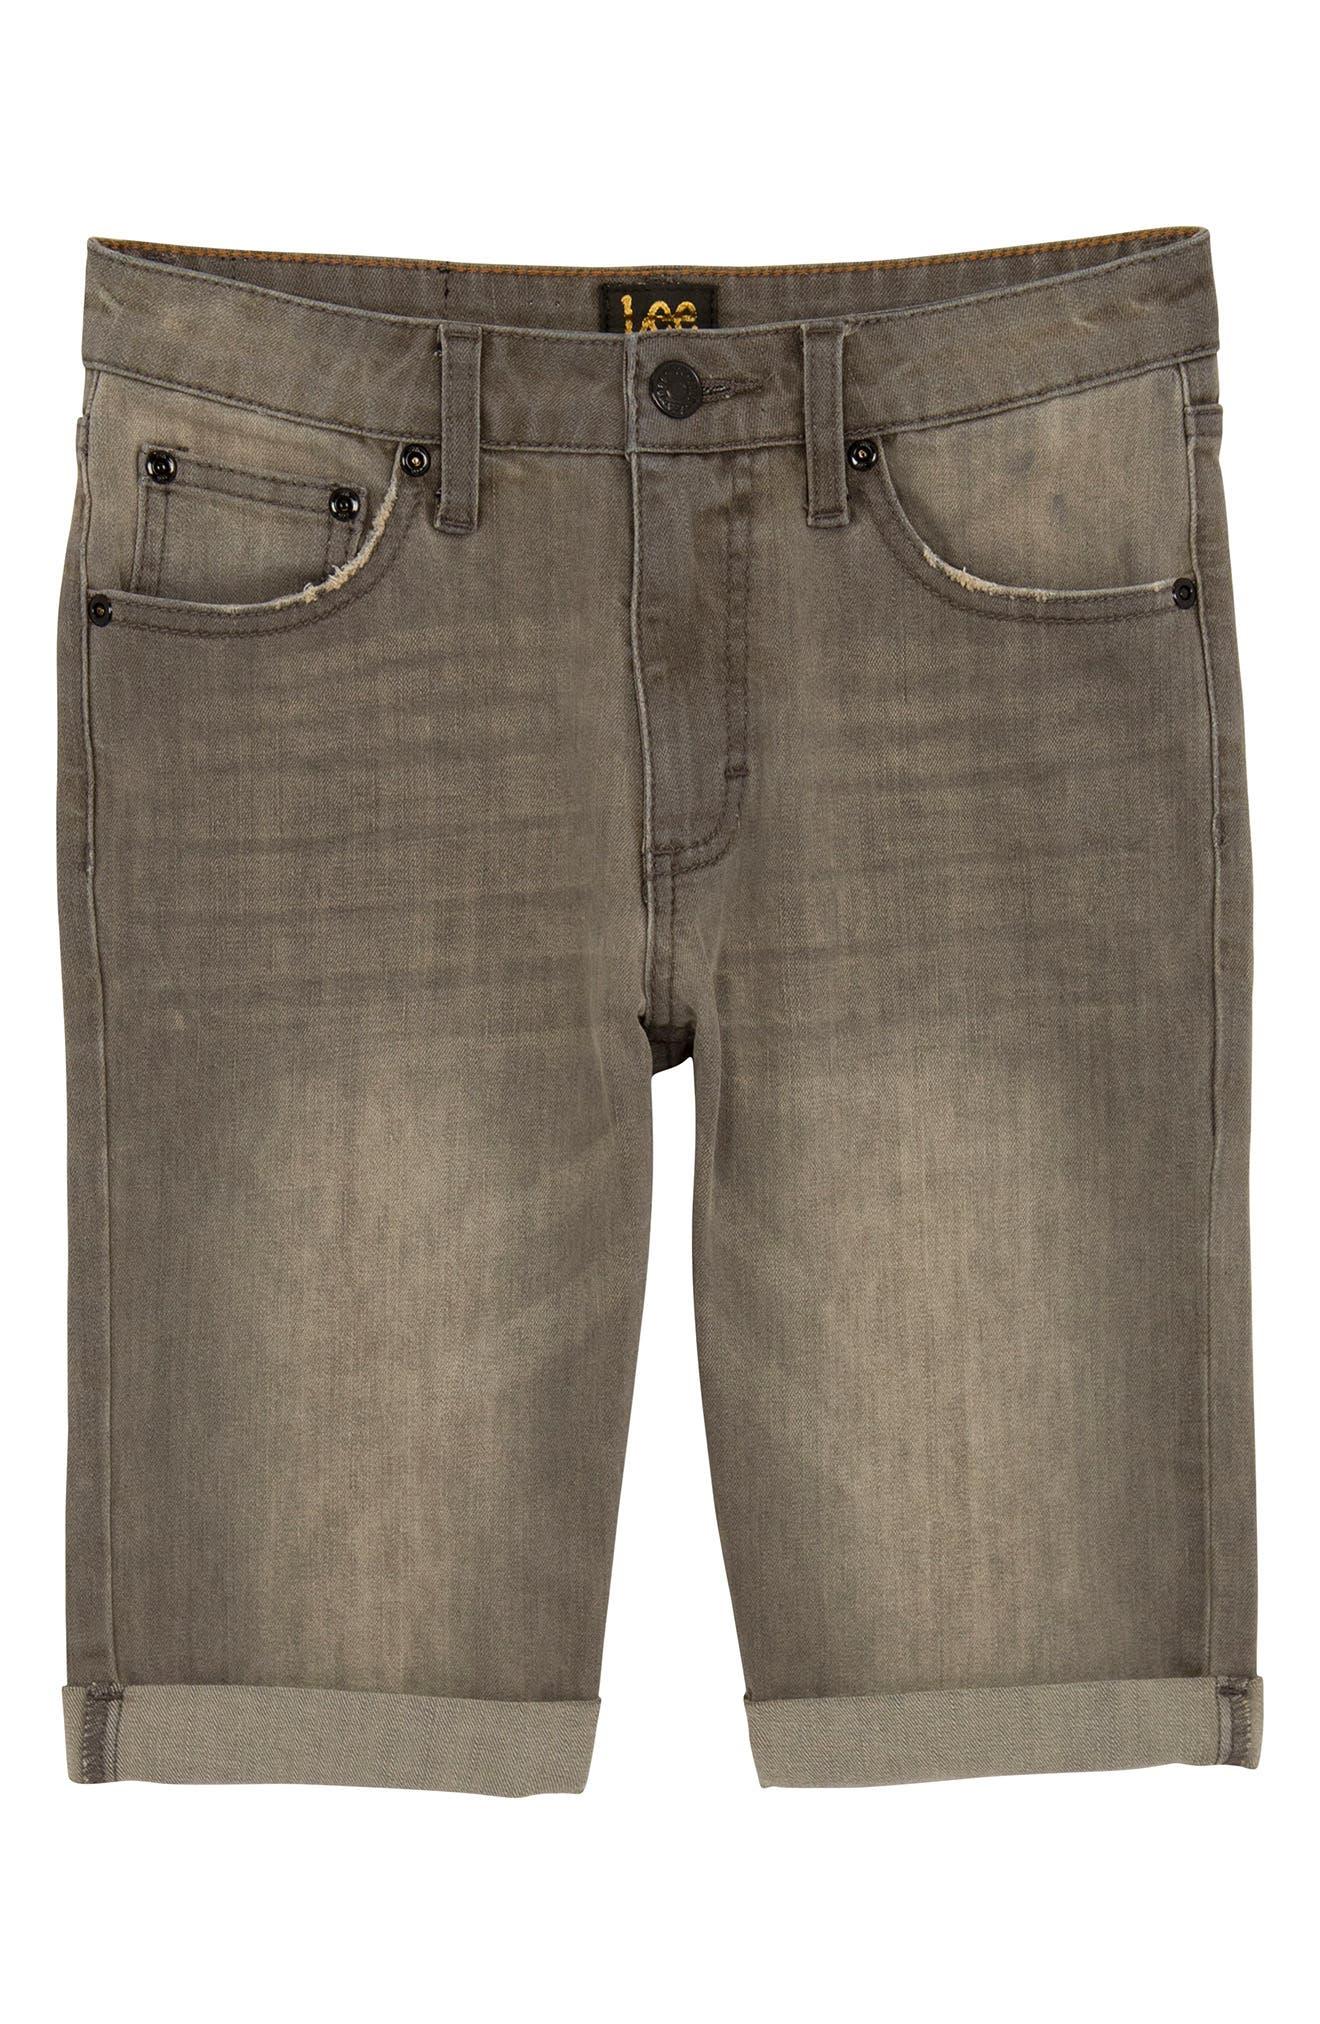 Alternate Image 1 Selected - Lee Straight Leg Cuffed Denim Shorts (Big Boys)